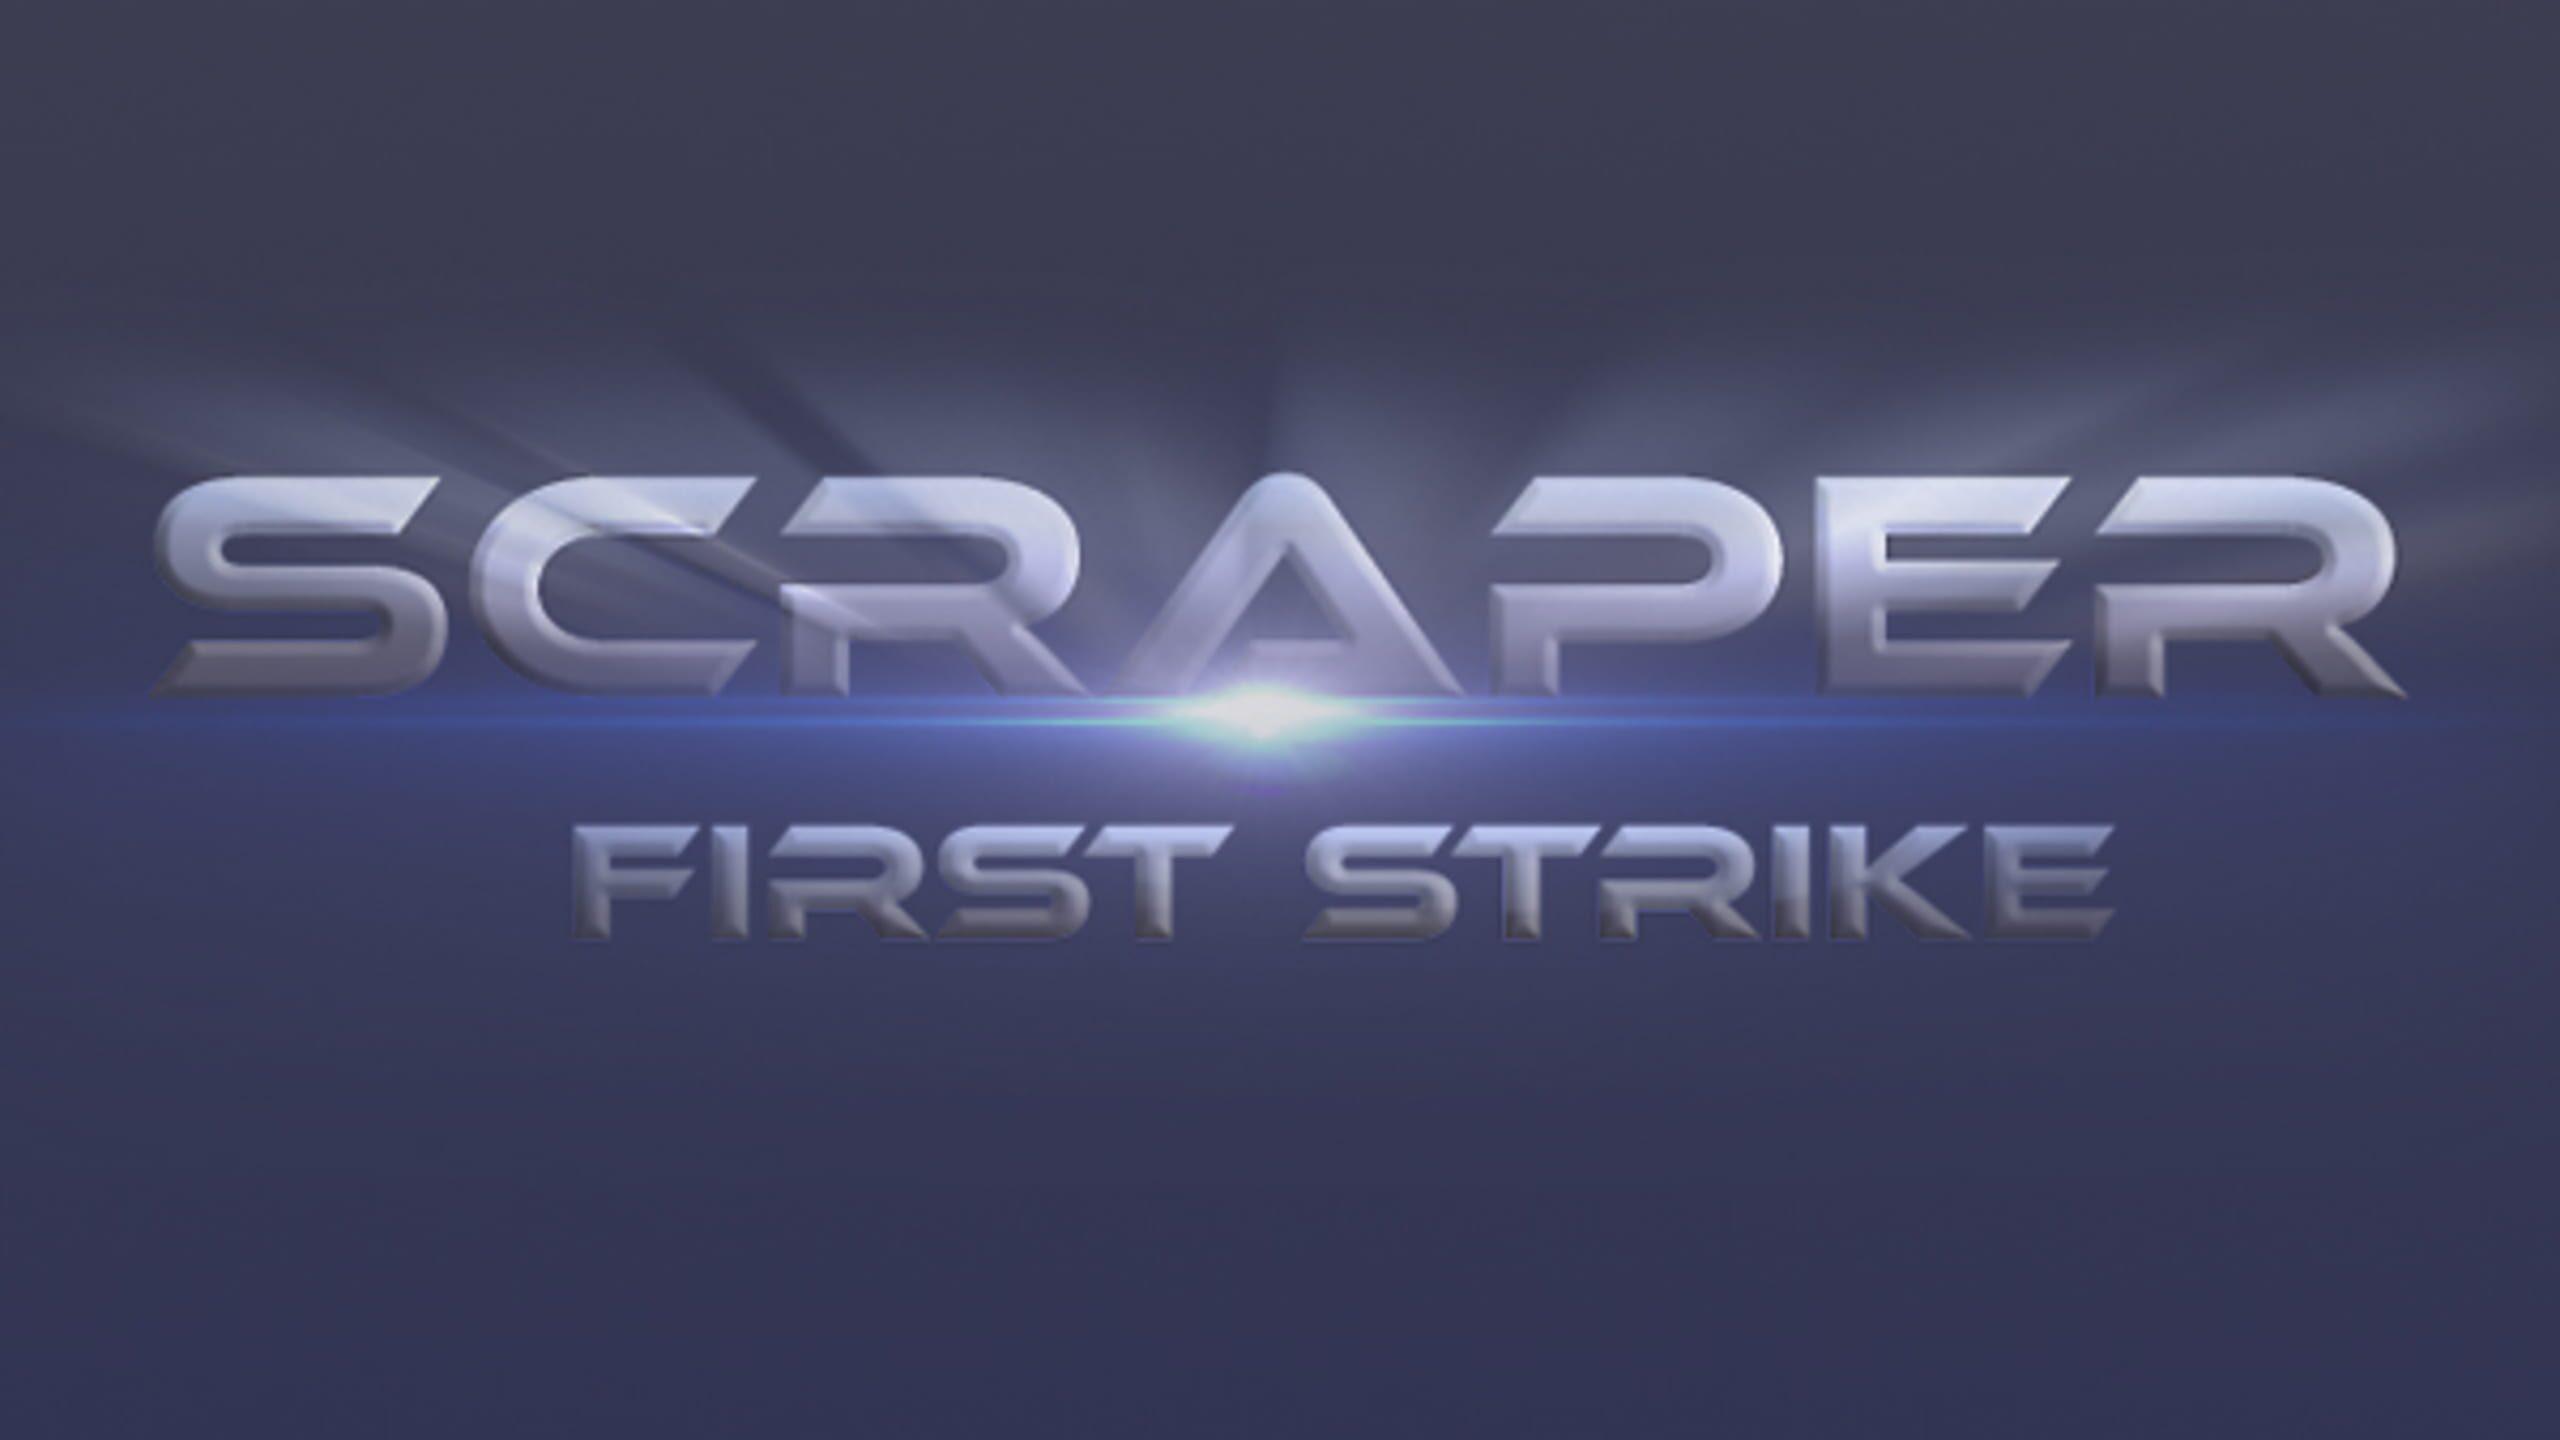 game cover art for Scraper: First Strike